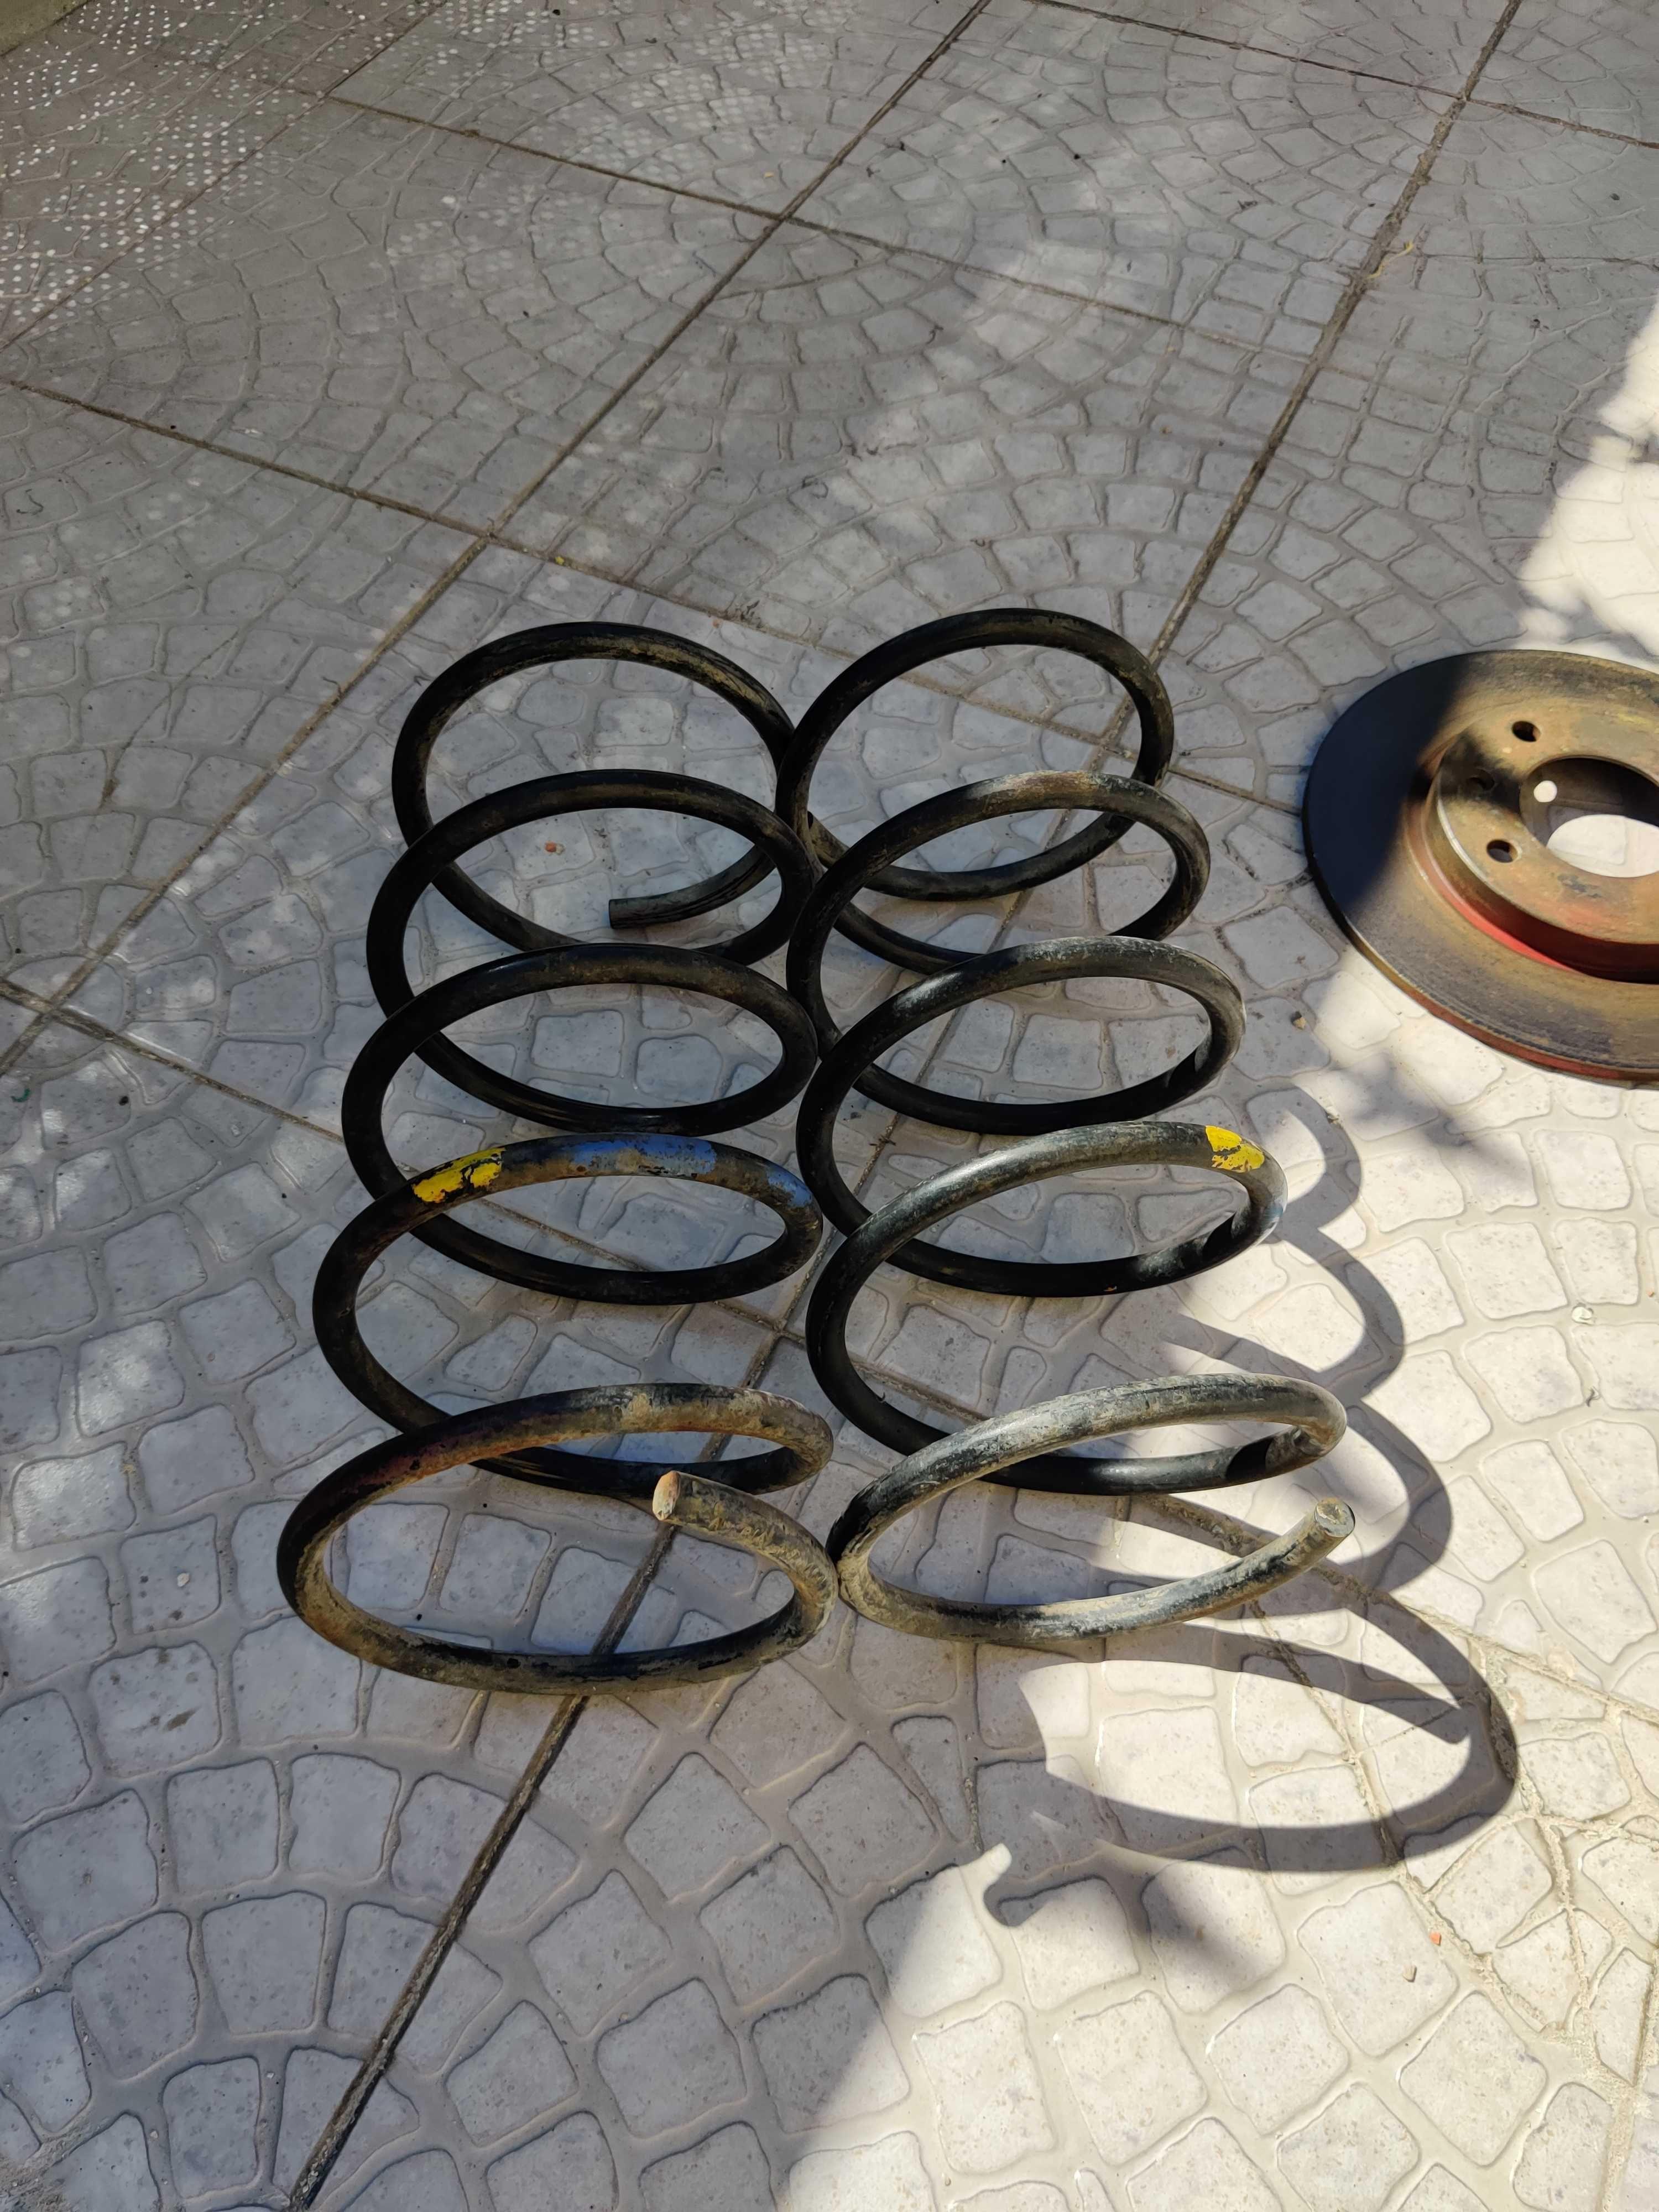 Molas originais Saxo Cup / 106 gti